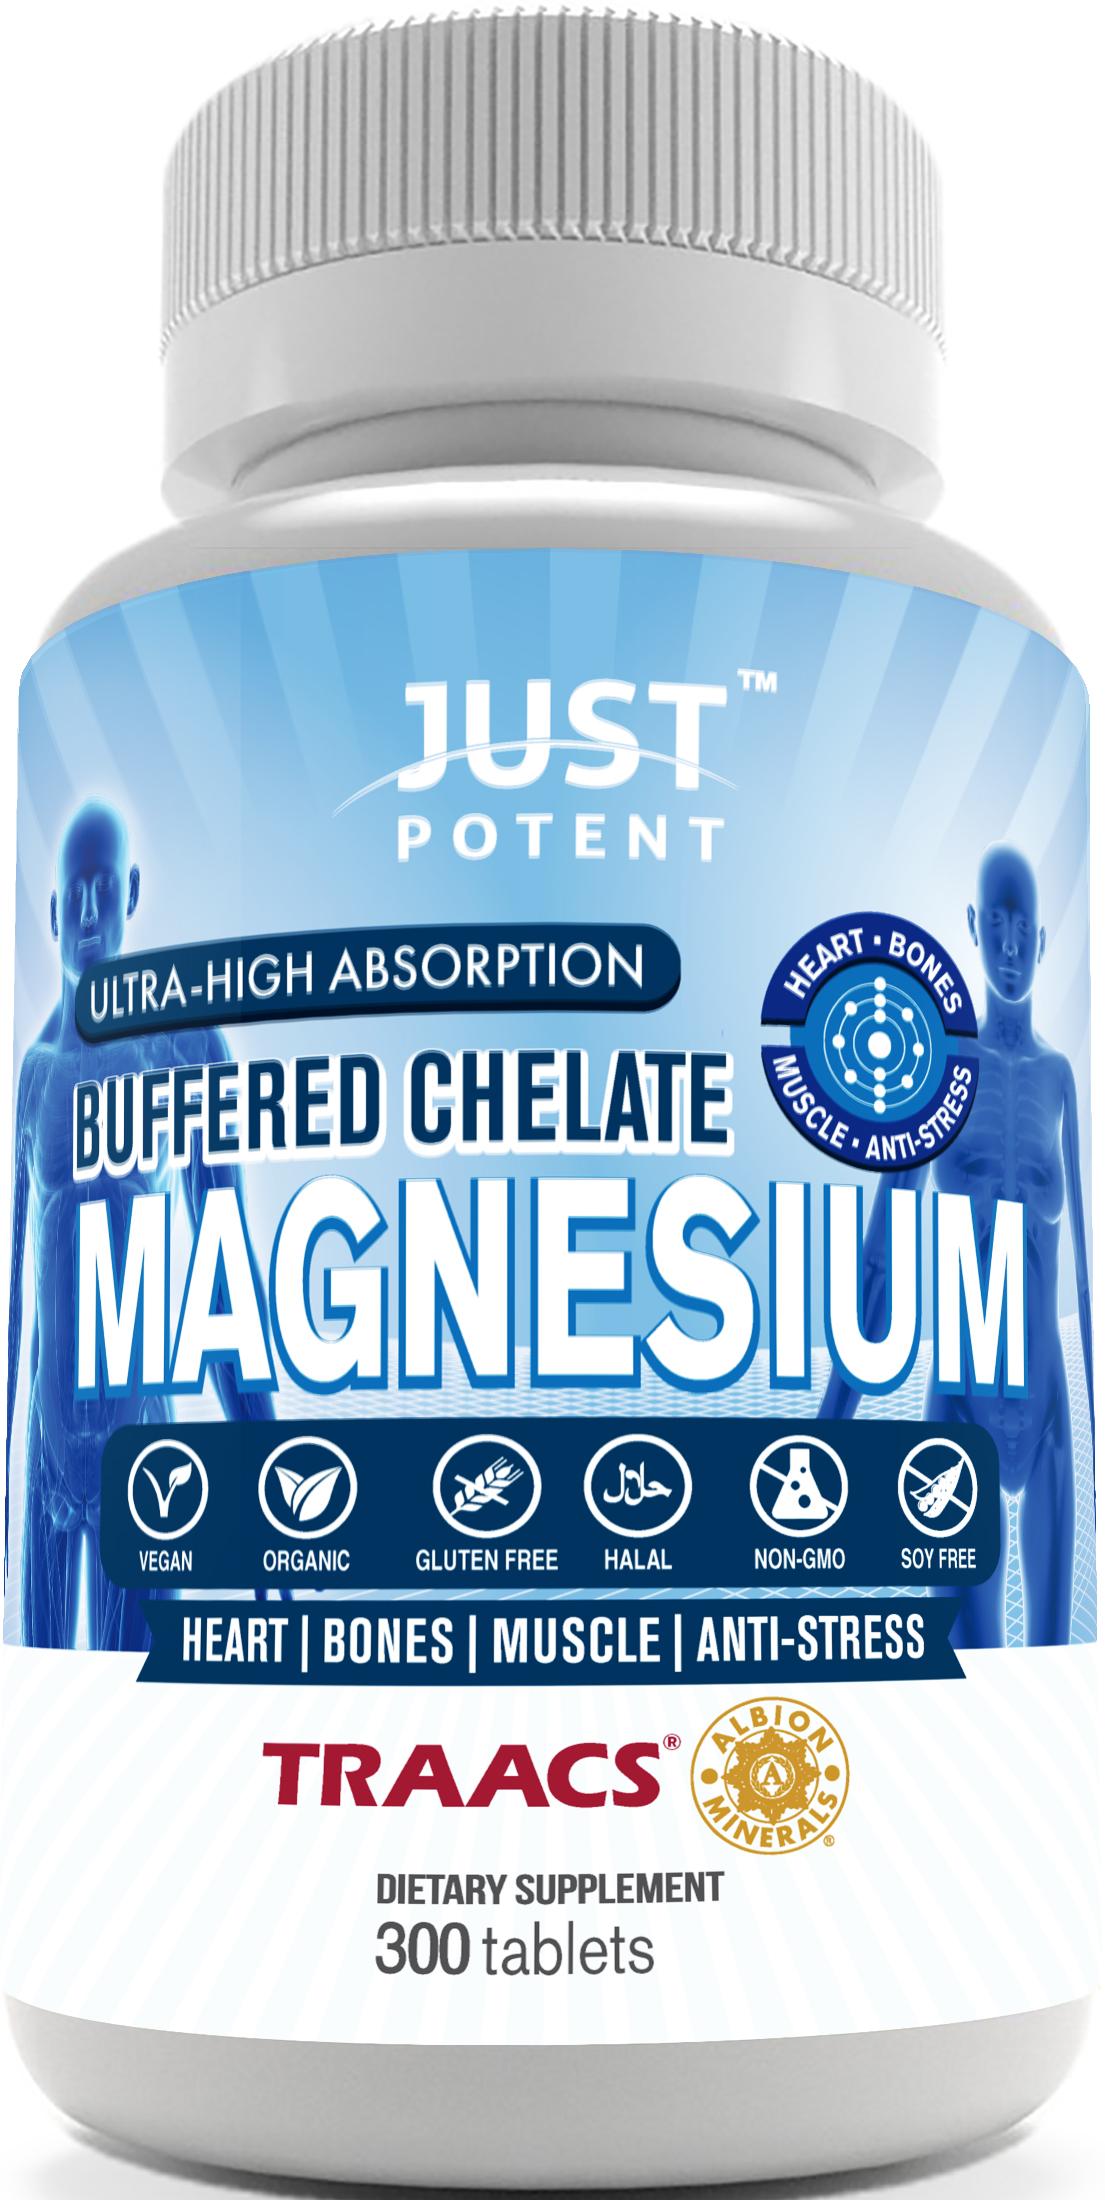 Just Potent Magnesium Supplement